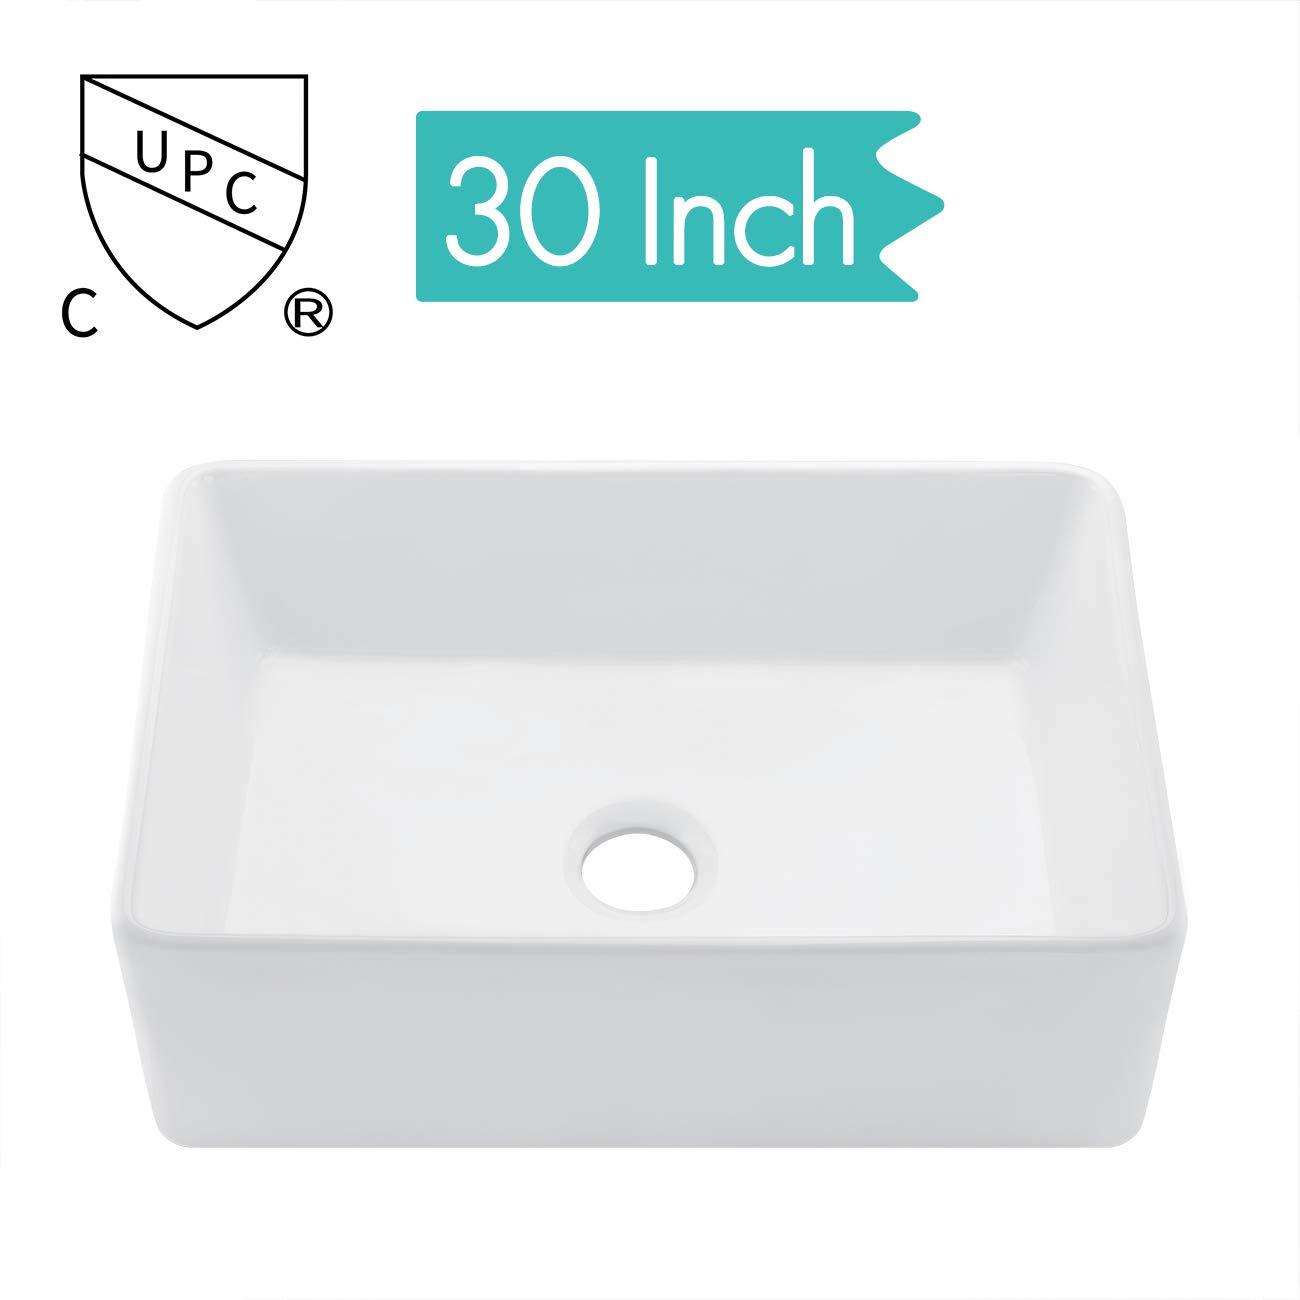 KES cUPC Fireclay Sink Farmhouse Kitchen Sink (30 Inch Porcelain Undermount  Rectangular White) BVS117